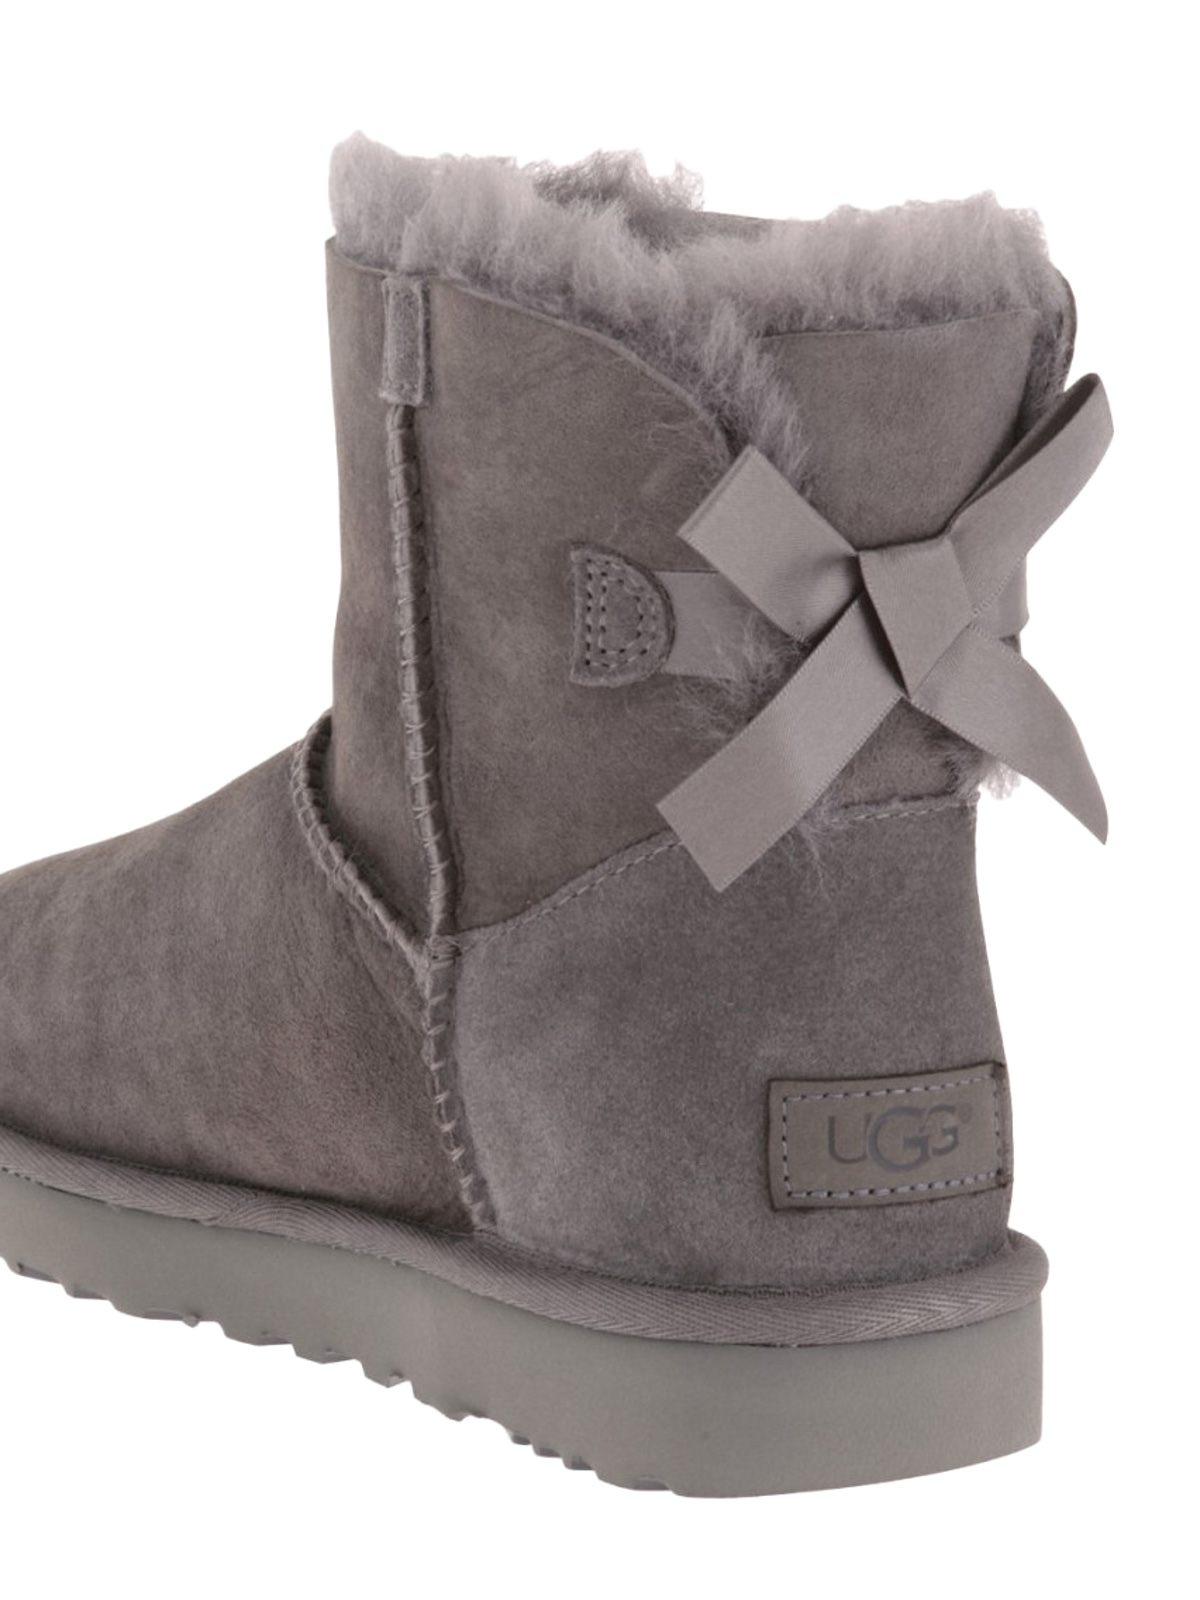 175952cd9767 Ugg - Mini Bailey Bow II booties - ankle boots - 1016501 GREY ...